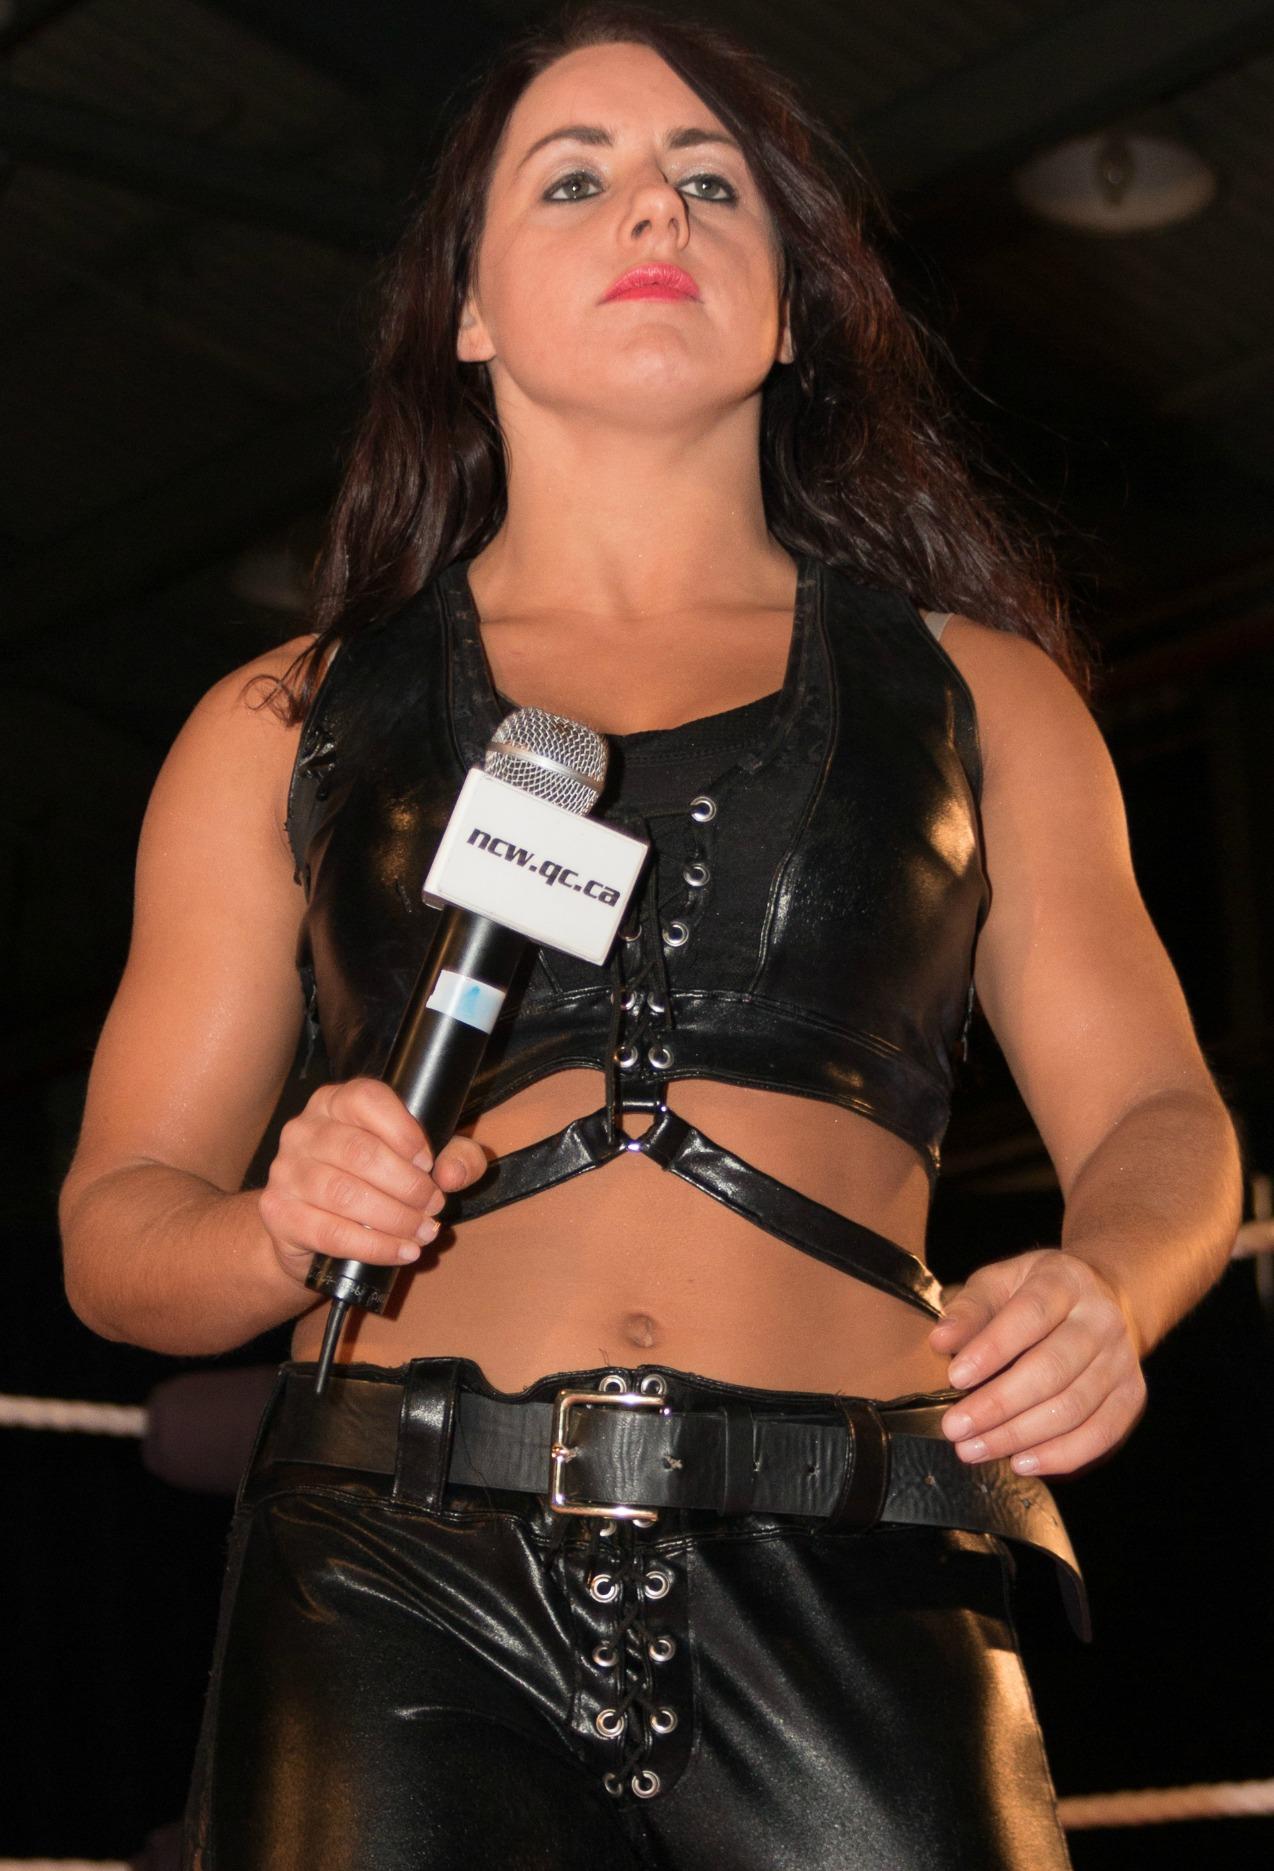 Nikki cross